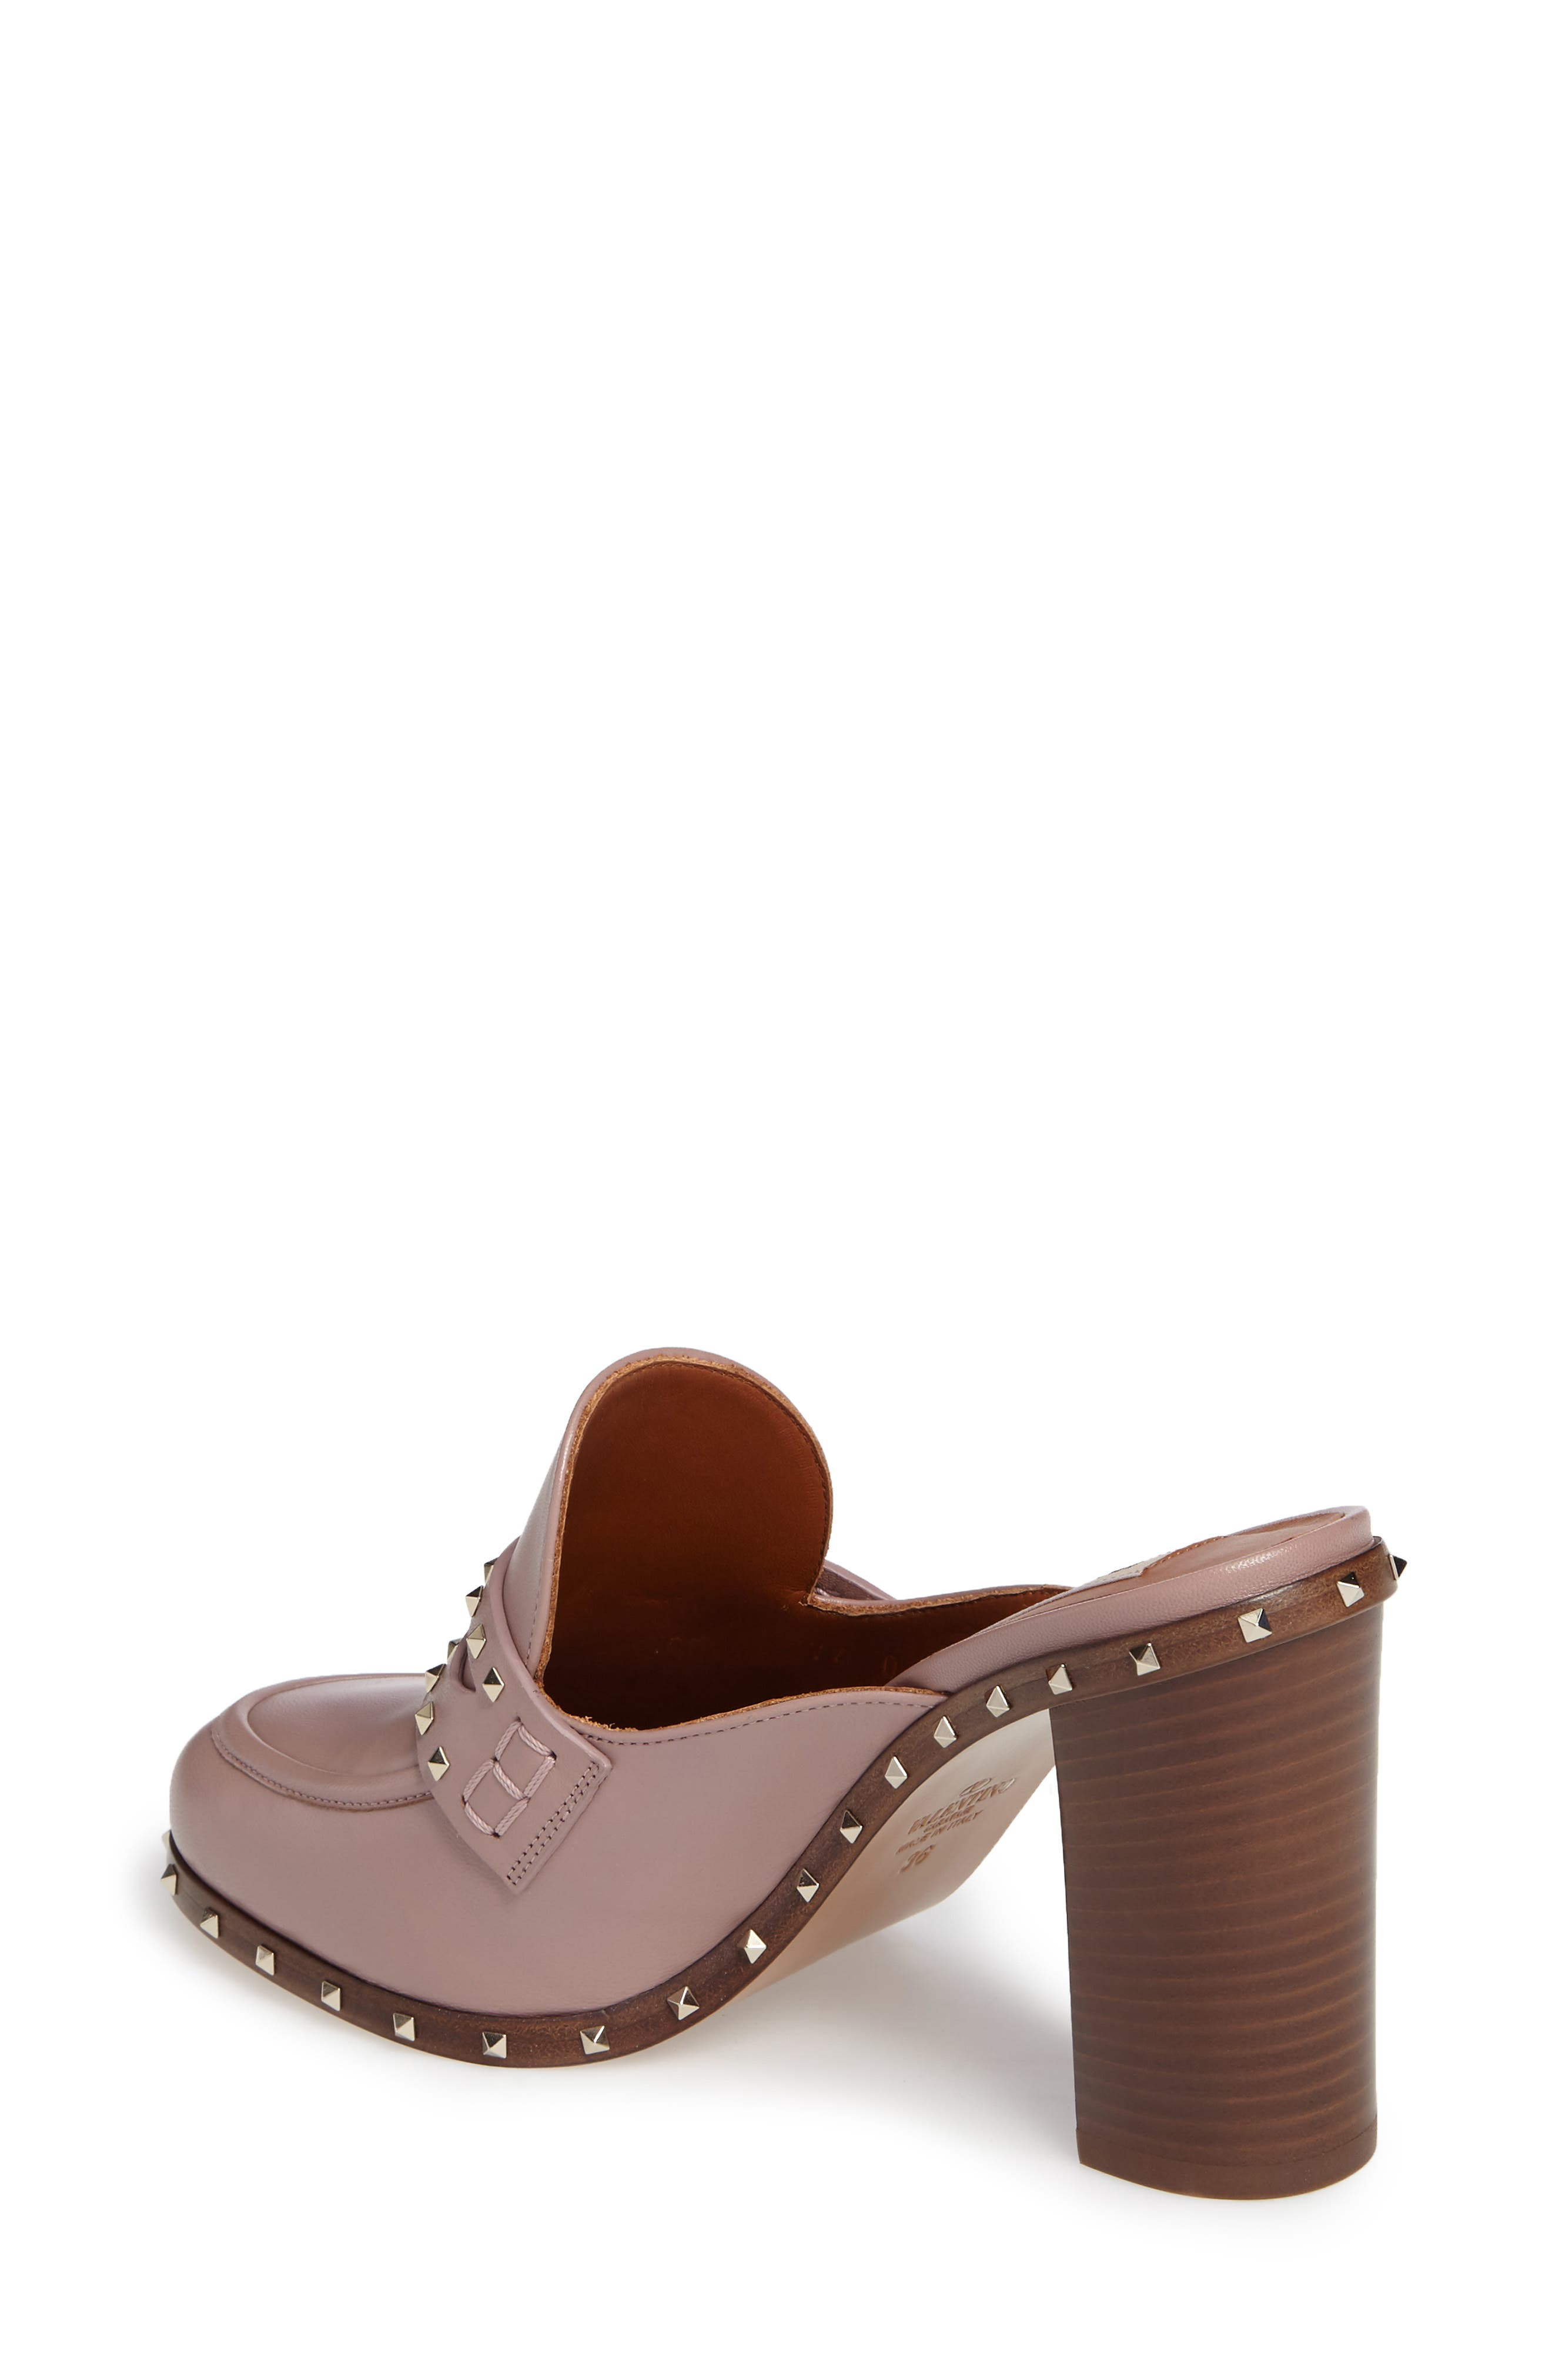 Rockstud Loafer Mule,                             Alternate thumbnail 2, color,                             Pink Leather